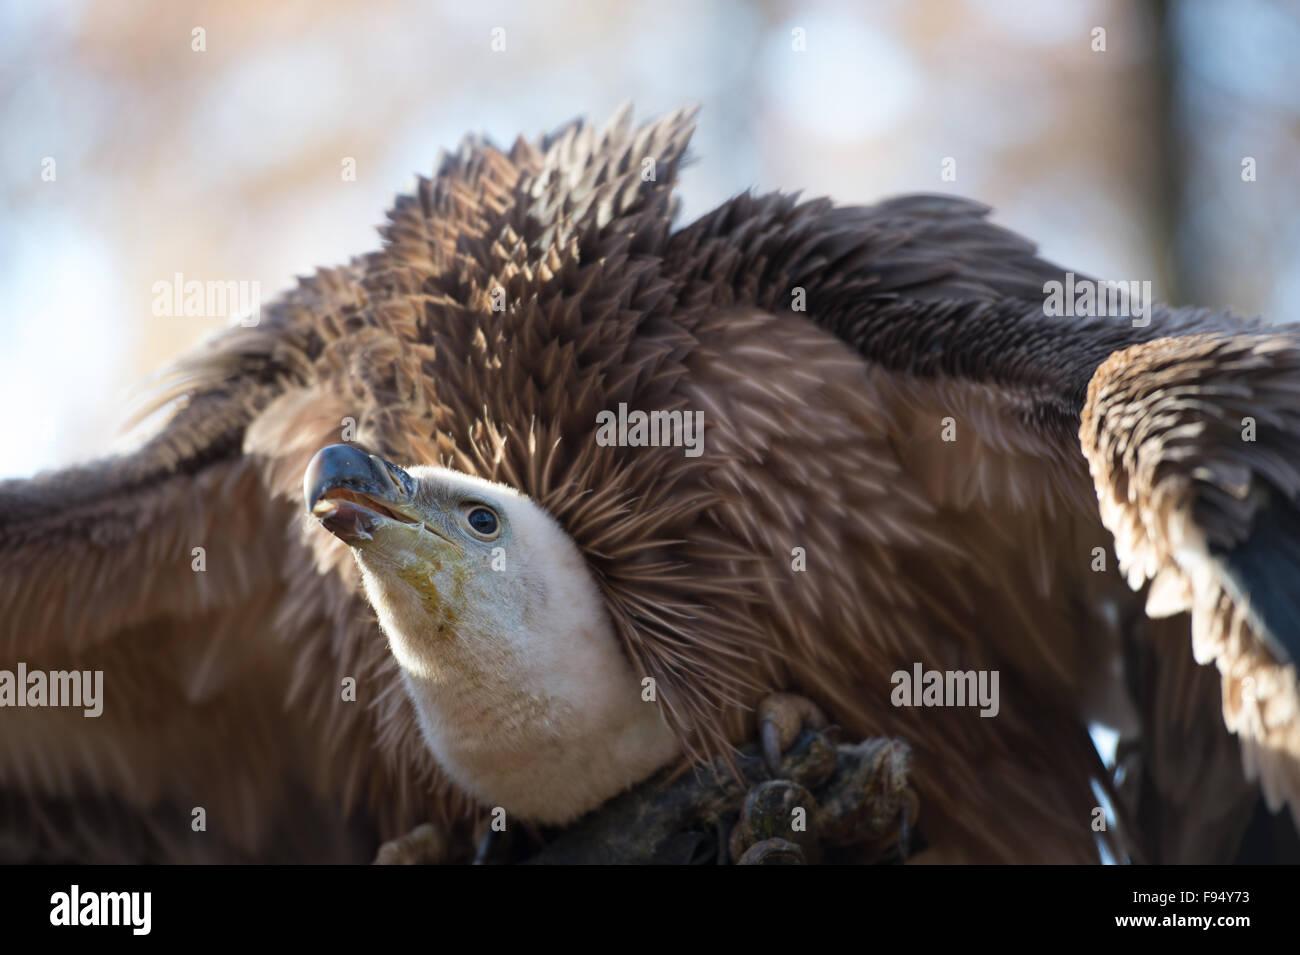 Eurasian griffon, Gyps fulvus, Accipitridae, Europe horizontal animal - Stock Image